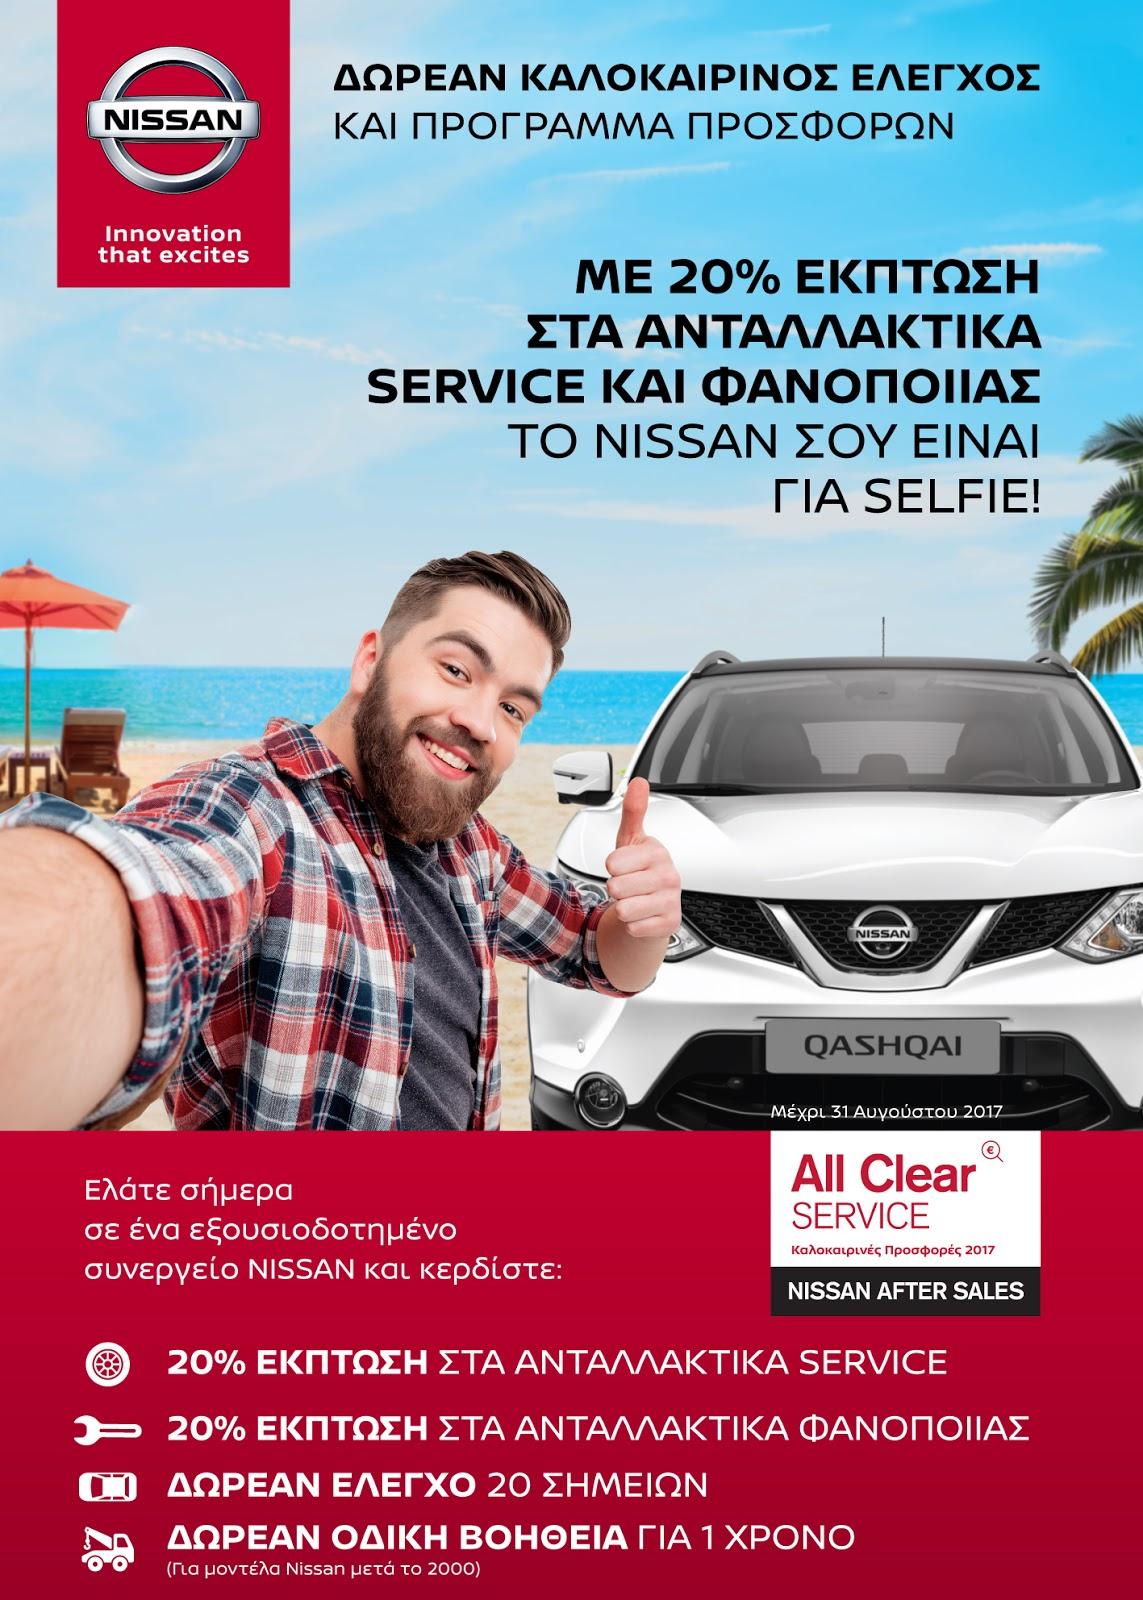 Nissan2BAfter2BSales Nissan After Sales Service: Αυτό το καλοκαίρι το Nissan σου είναι για… Selfie! Nissan, service, summer check-up